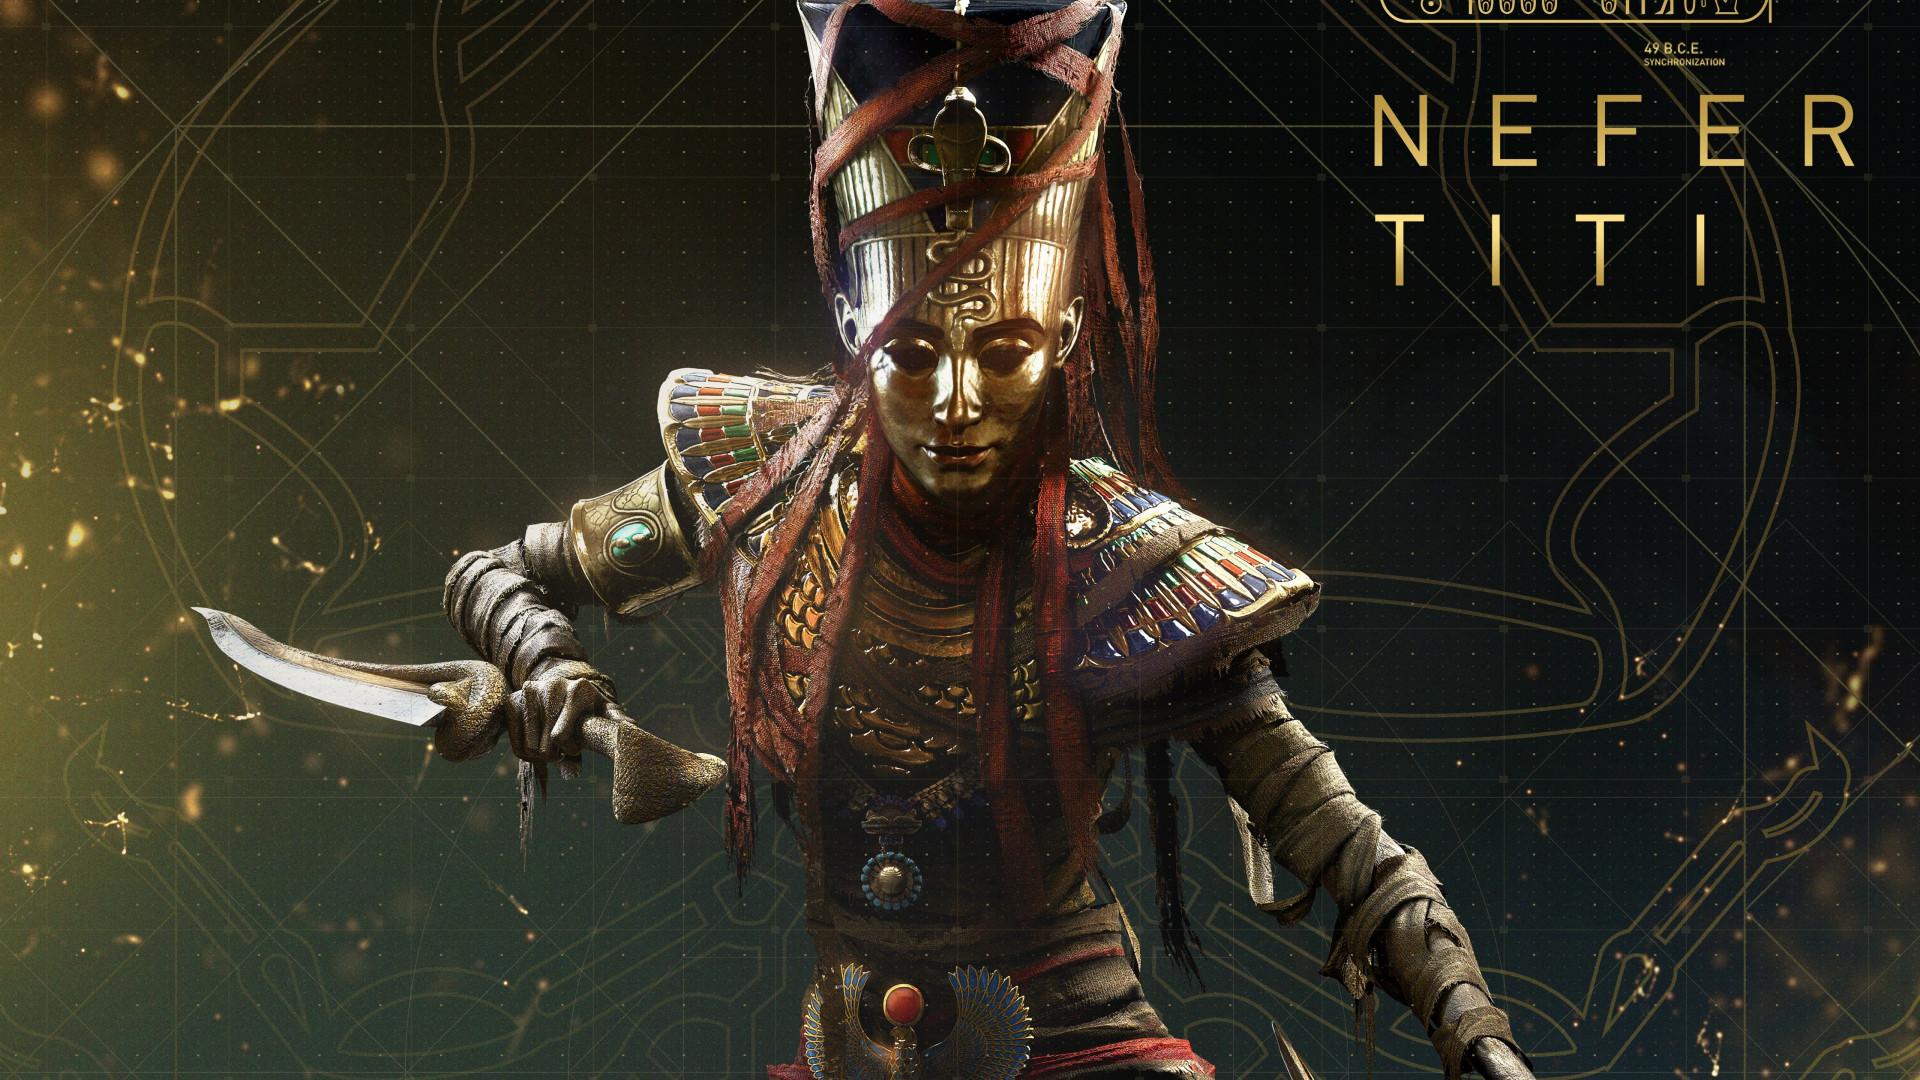 Download Wallpaper Nefertiti From Assassin S Creed Origins 1920x1080